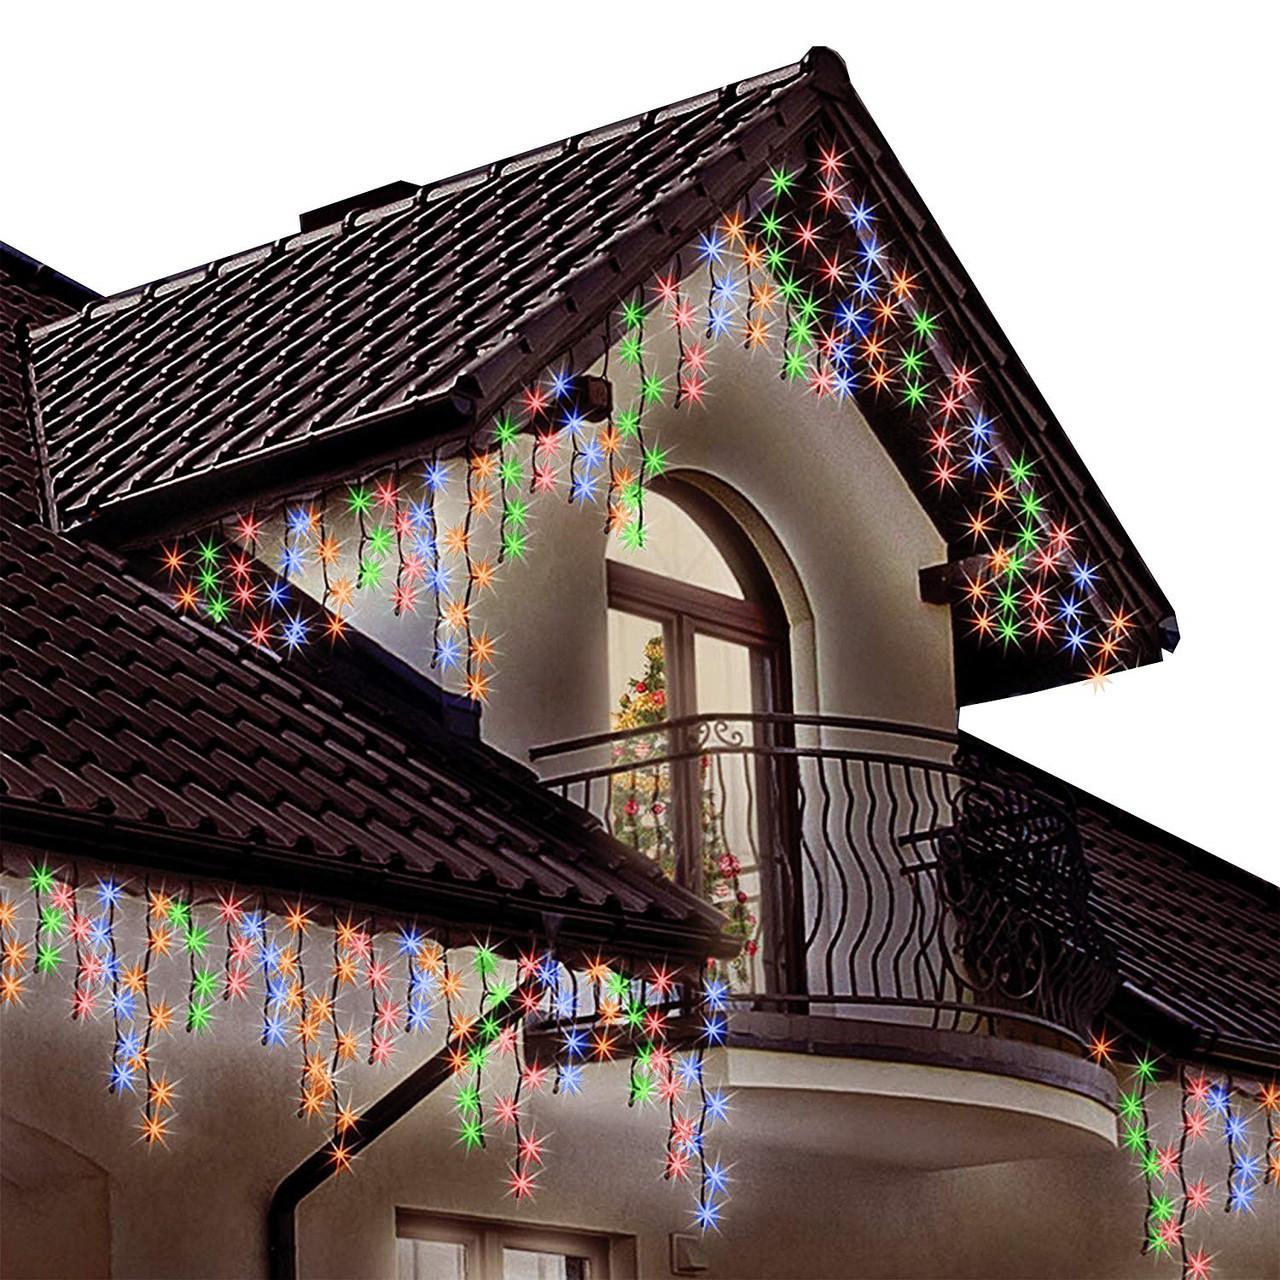 Гирлянда бахрома 3 x 0,6 м, уличная, с мерцанием, на черном каучуковом проводе 105 led цвет RGB